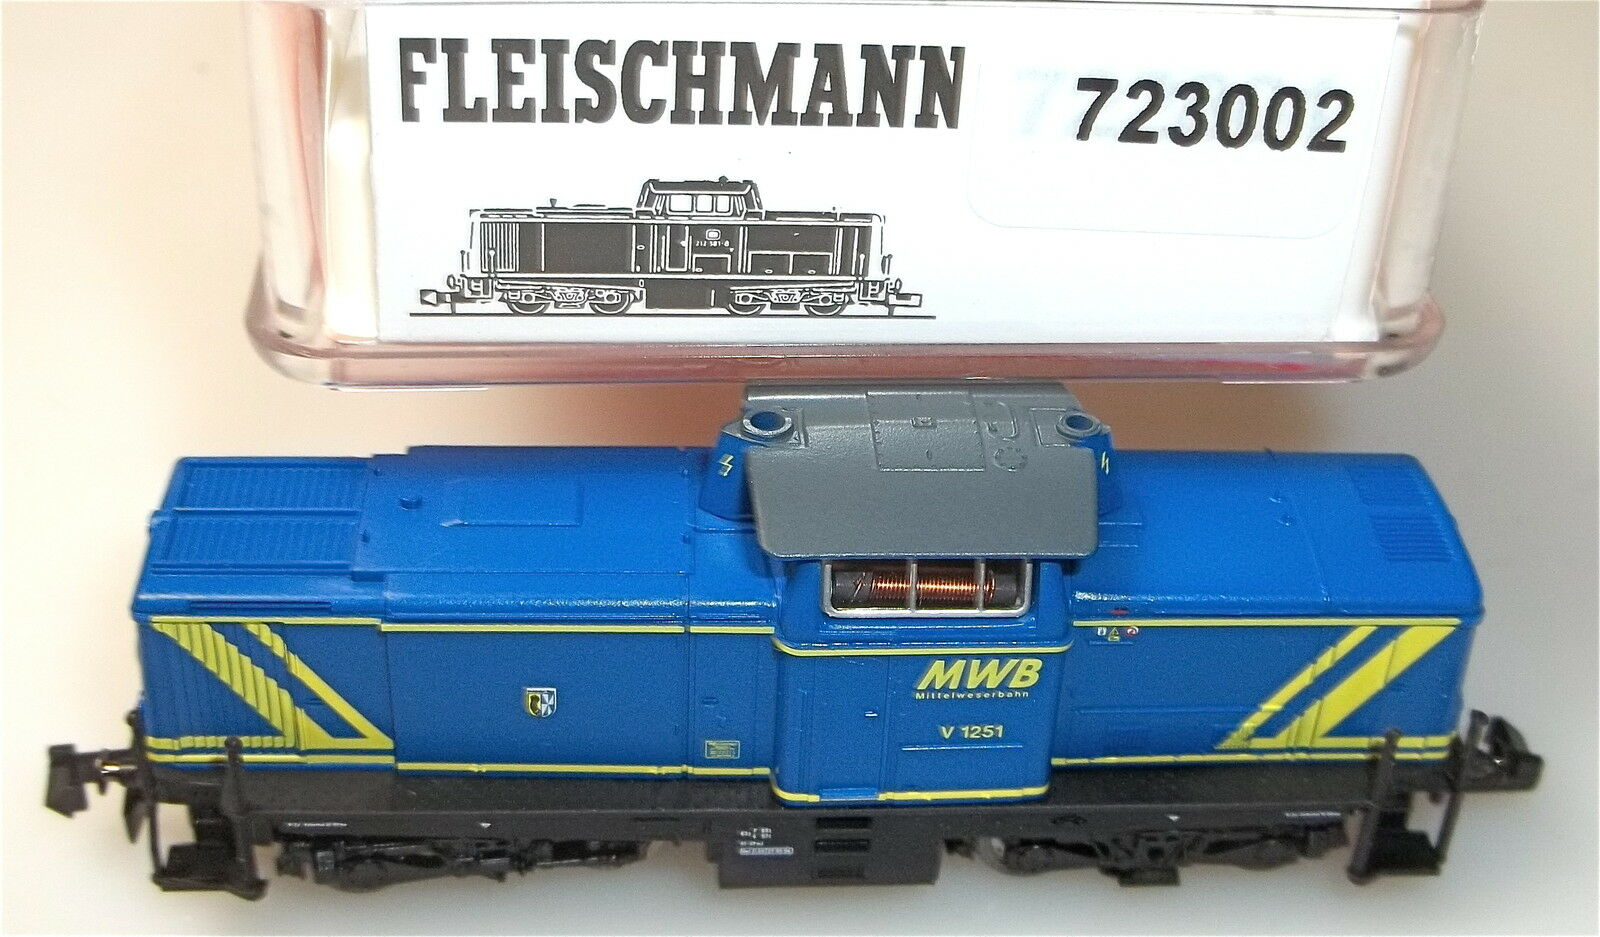 Diesellok V 12 la concedió mittelweserbahn Fleischmann 723002 nuevo embalaje original 1 160 hs3 µg